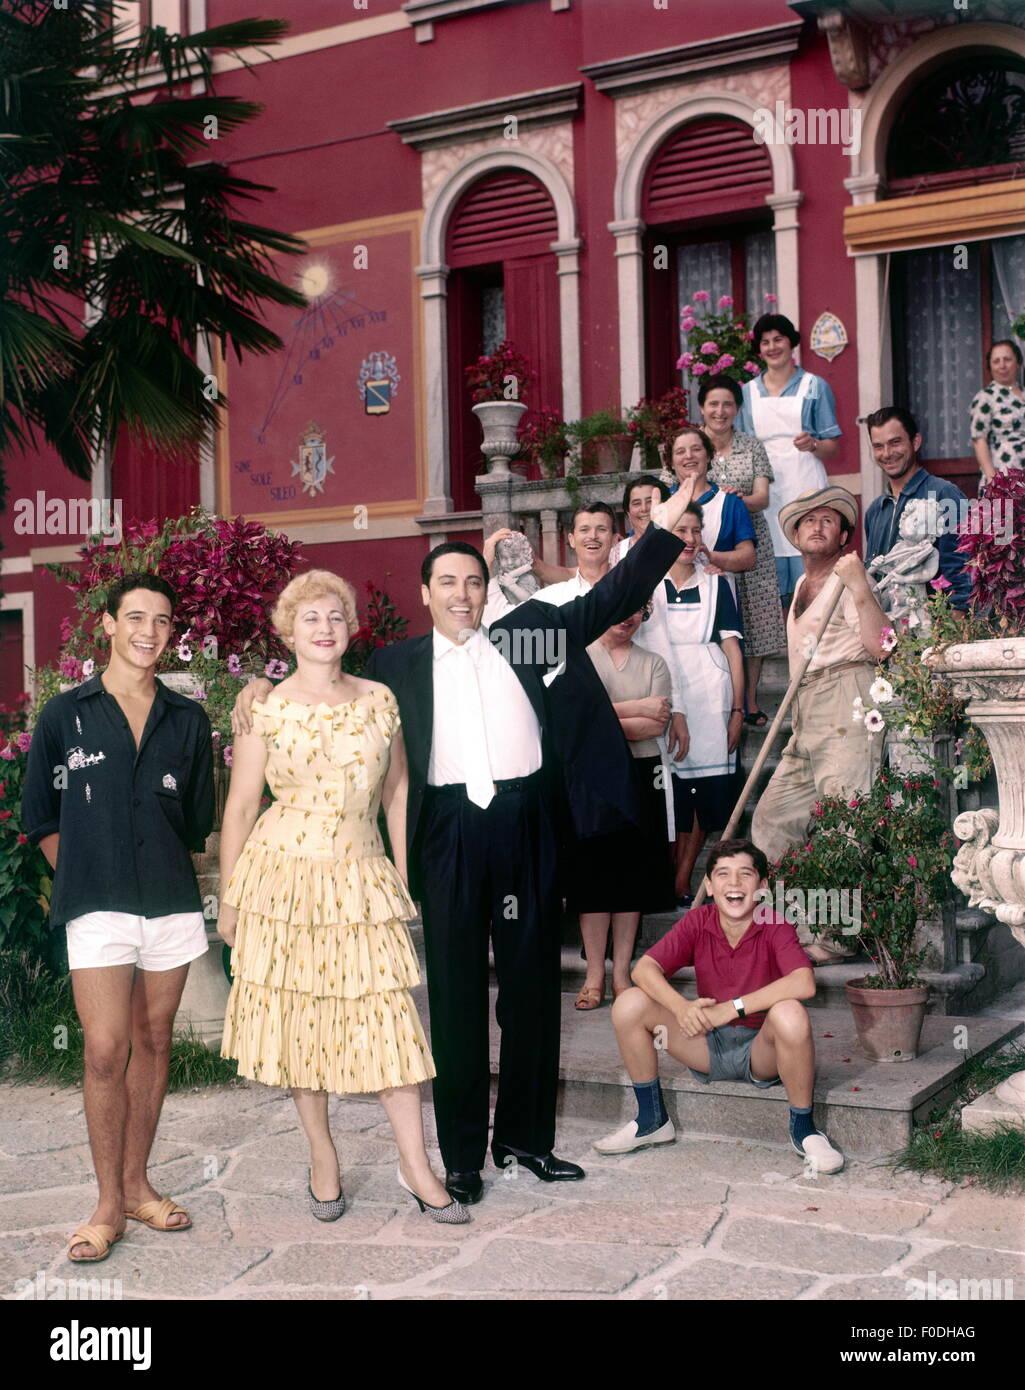 Monaco, Mario del, 27.7.1915 - 16.10.1982, Italian singer (tenor), half length, with with Fedora, sons Giancarlo - Stock Image